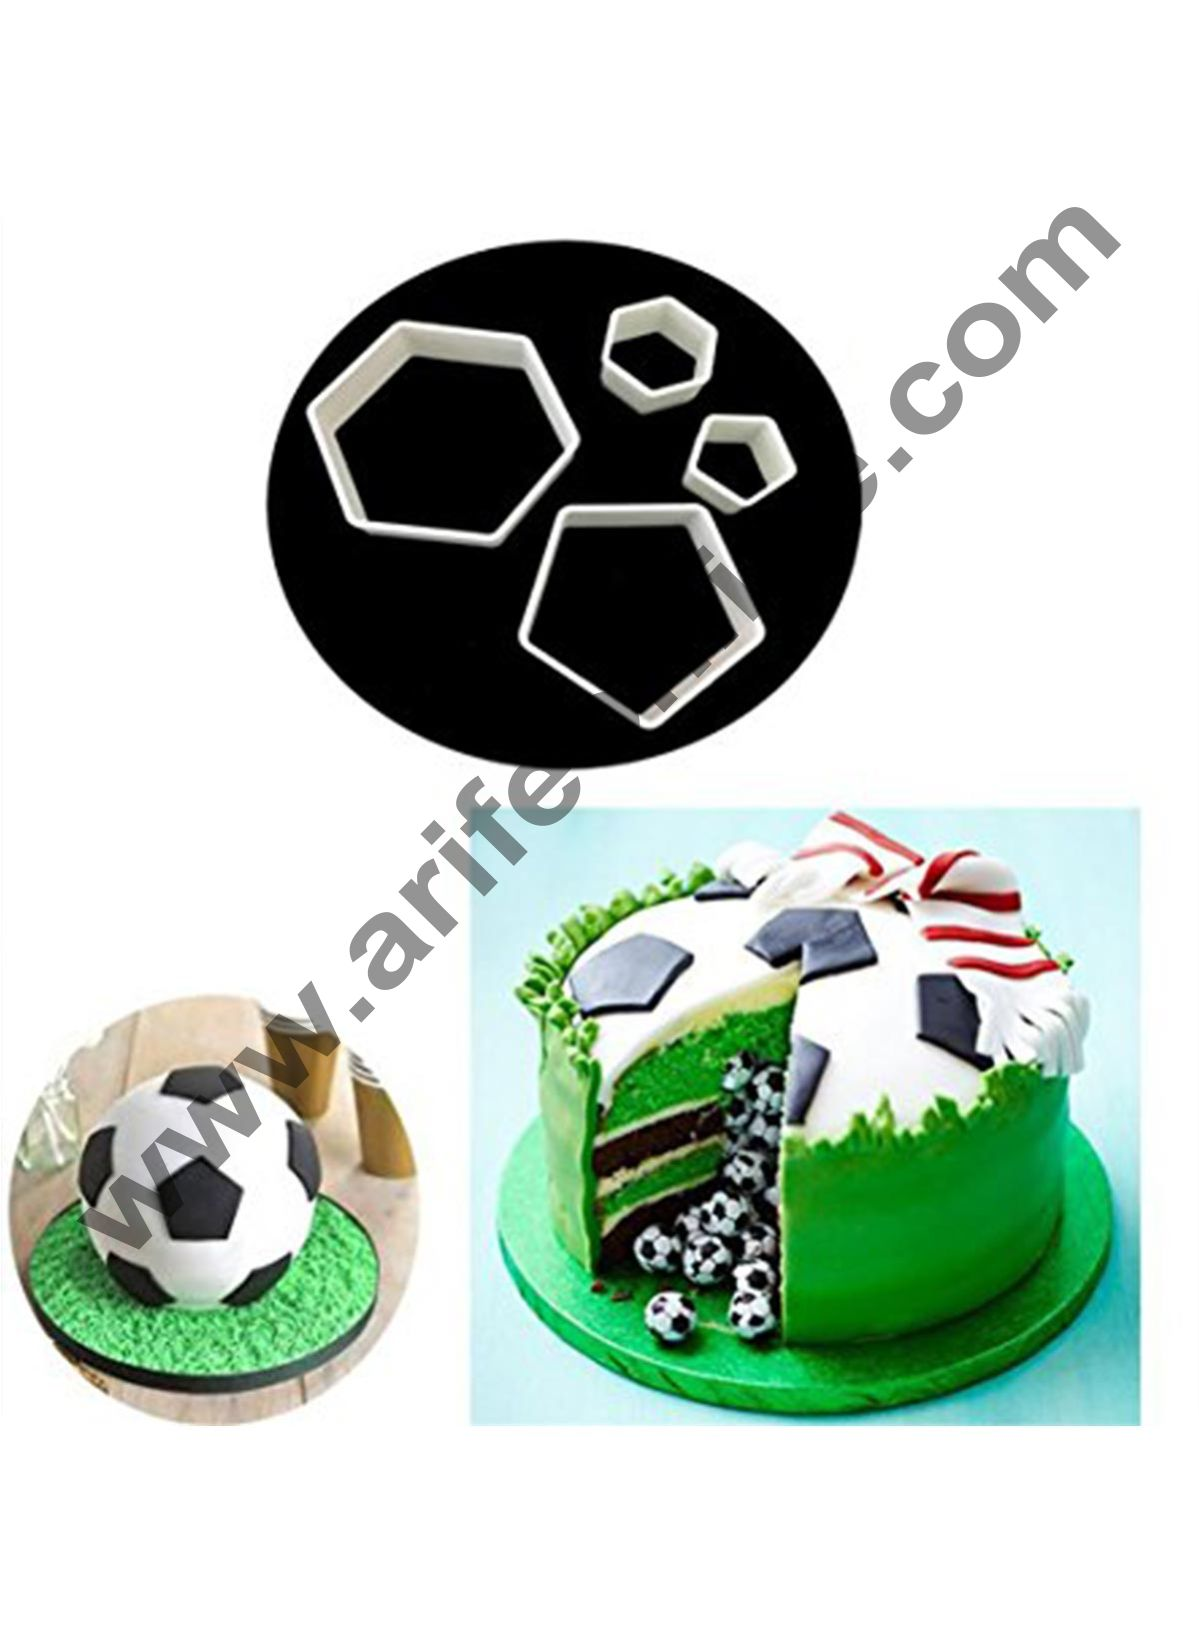 Cake Decor 4pcs Plastic Football Shape Cookie Cutter Stamp Sugarcraft Baking Mould Fondant Cake Decorating Tools